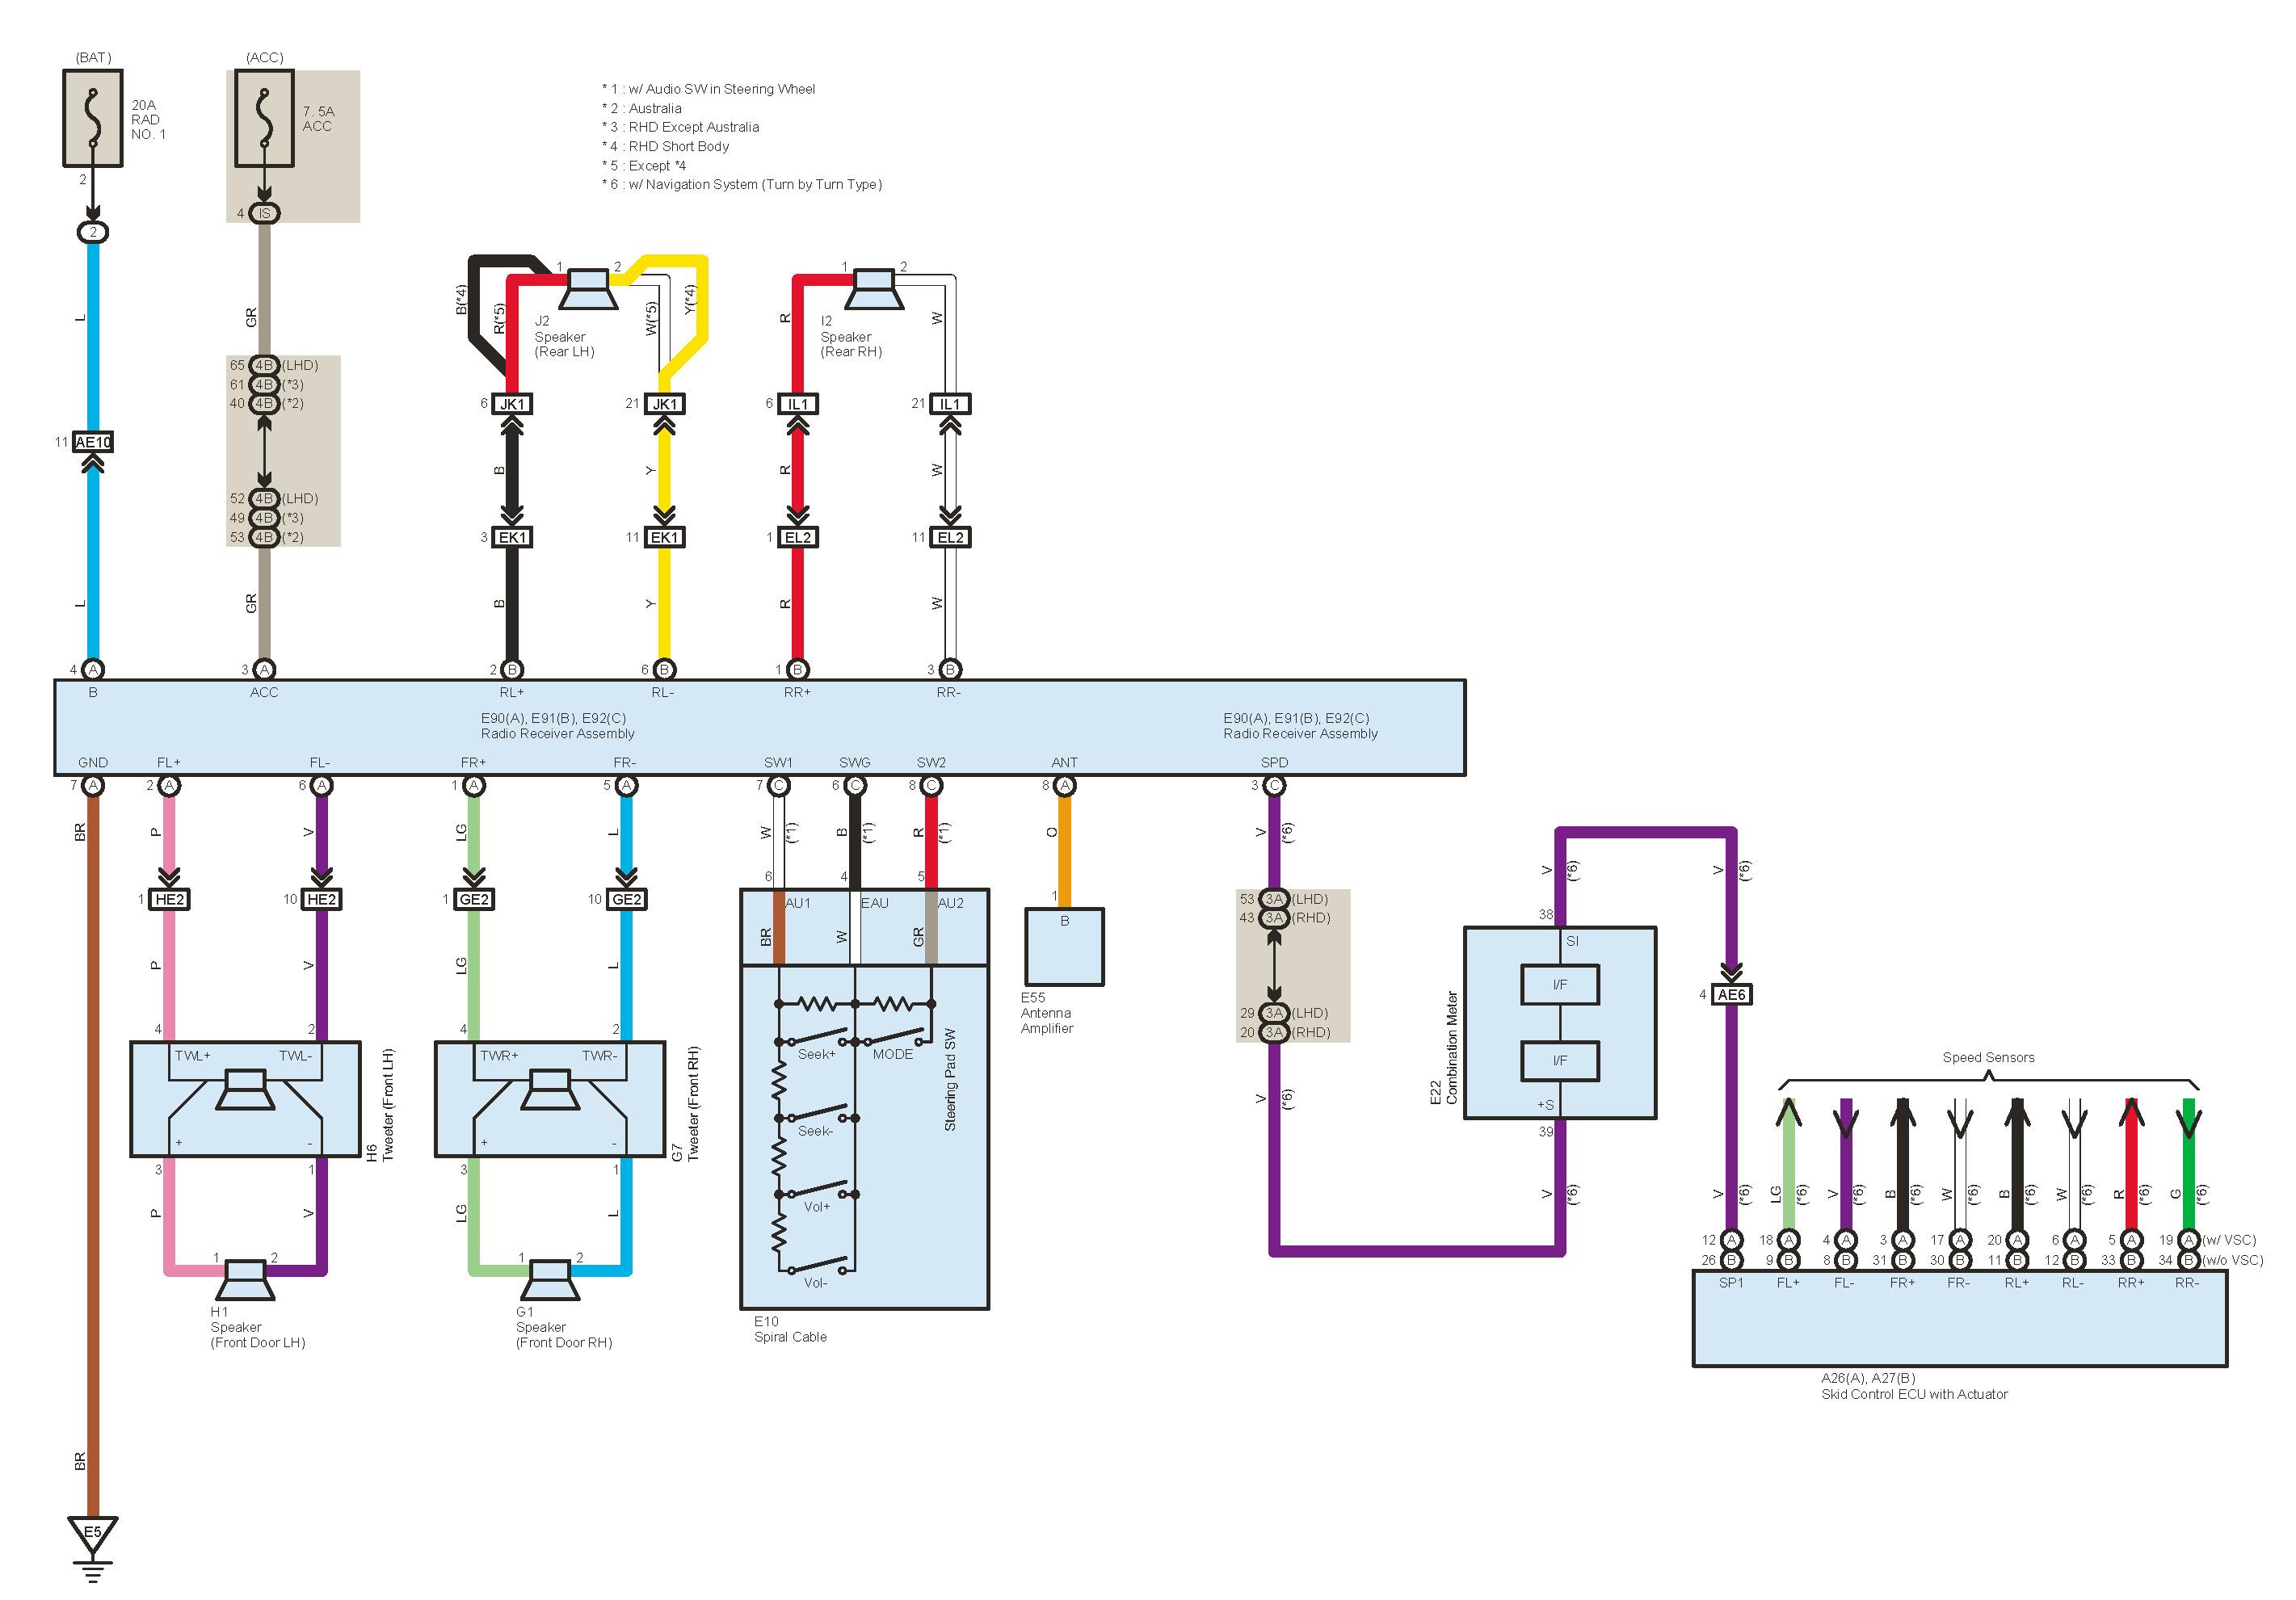 Viper 5706V Wiring Diagram 2014 Tundra   Wiring Diagram - Viper 5706V Wiring Diagram